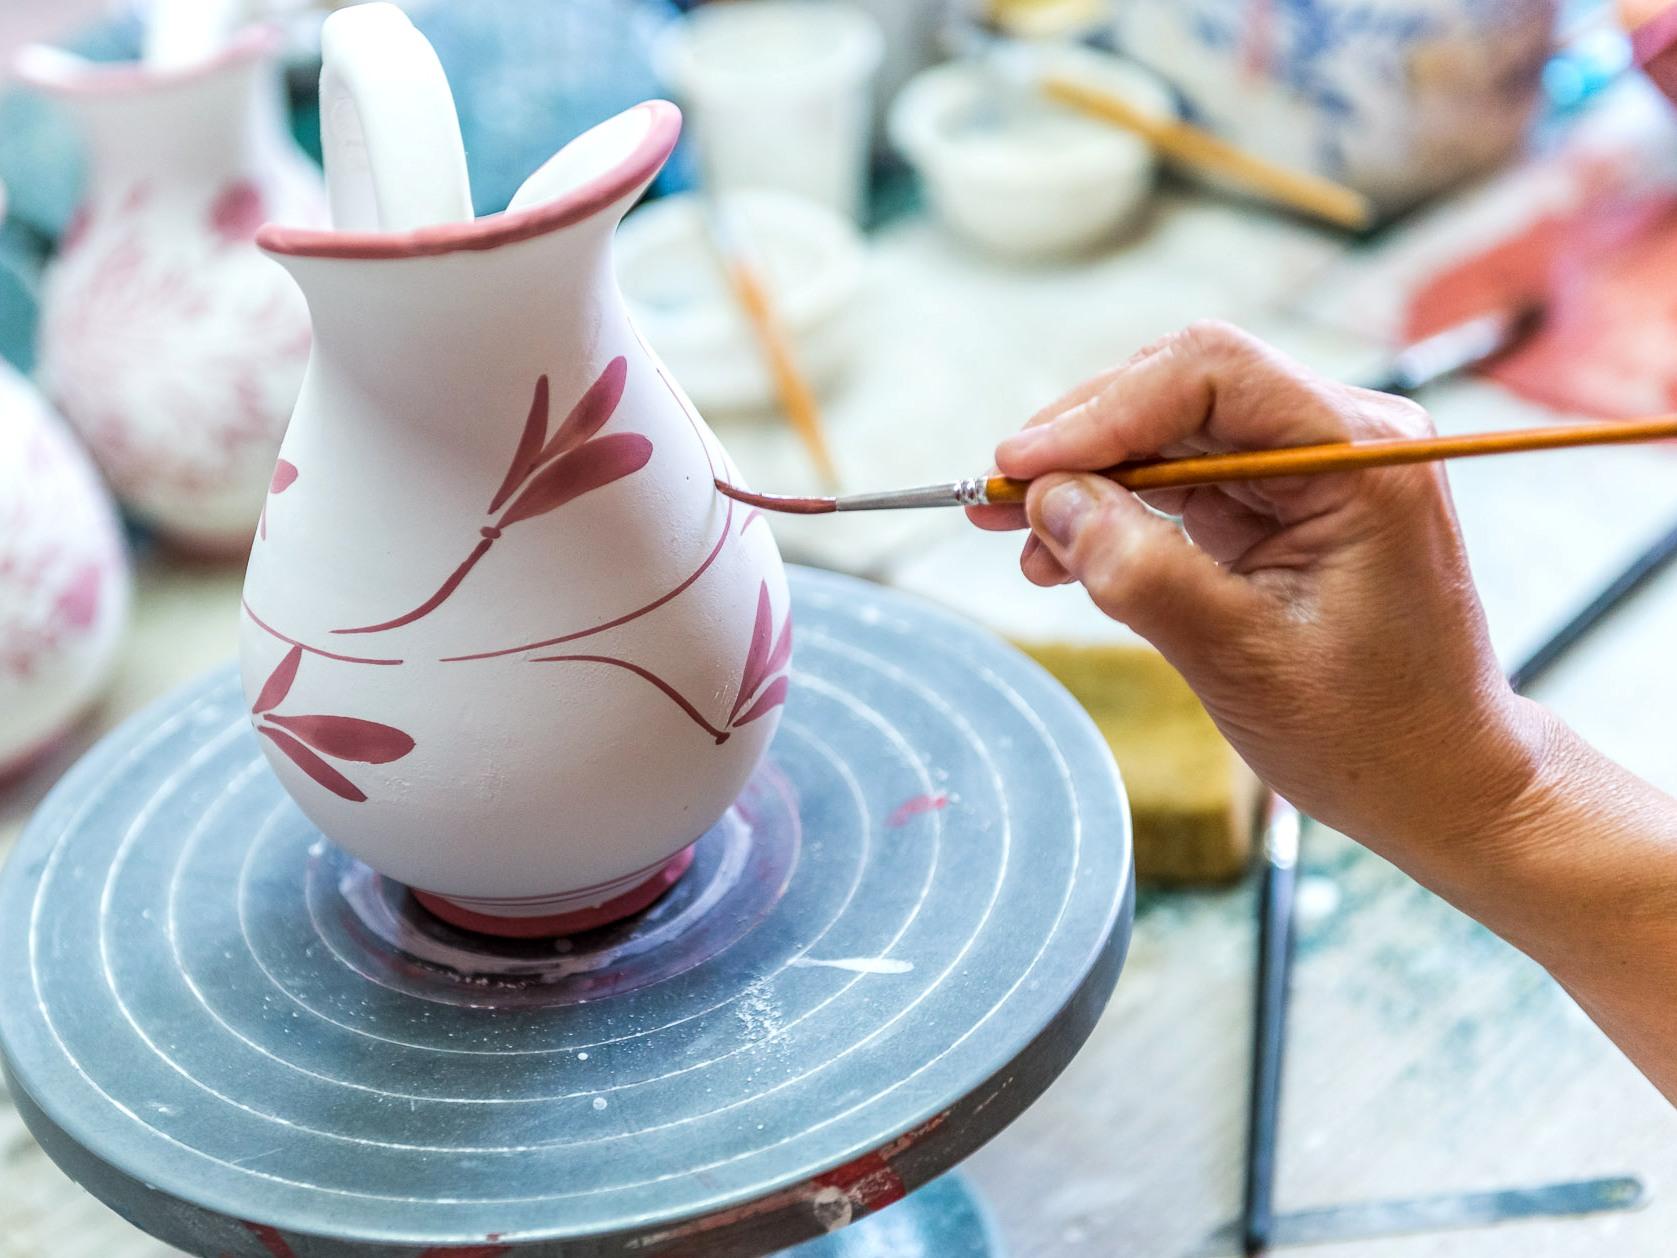 краска для керамики и фарфора